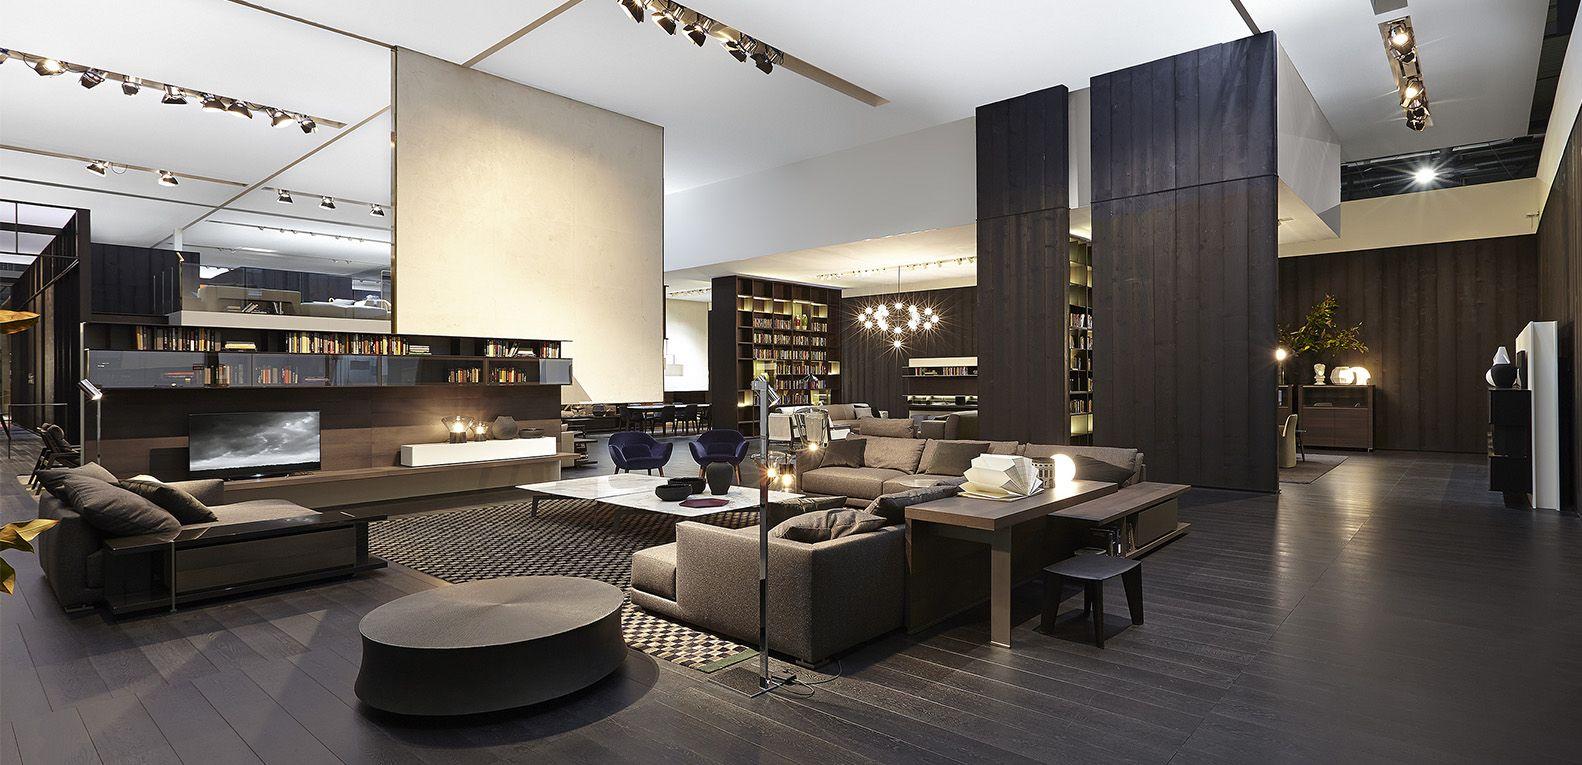 Poliform6 casas pinterest interiors living rooms - Poliform showroom ...